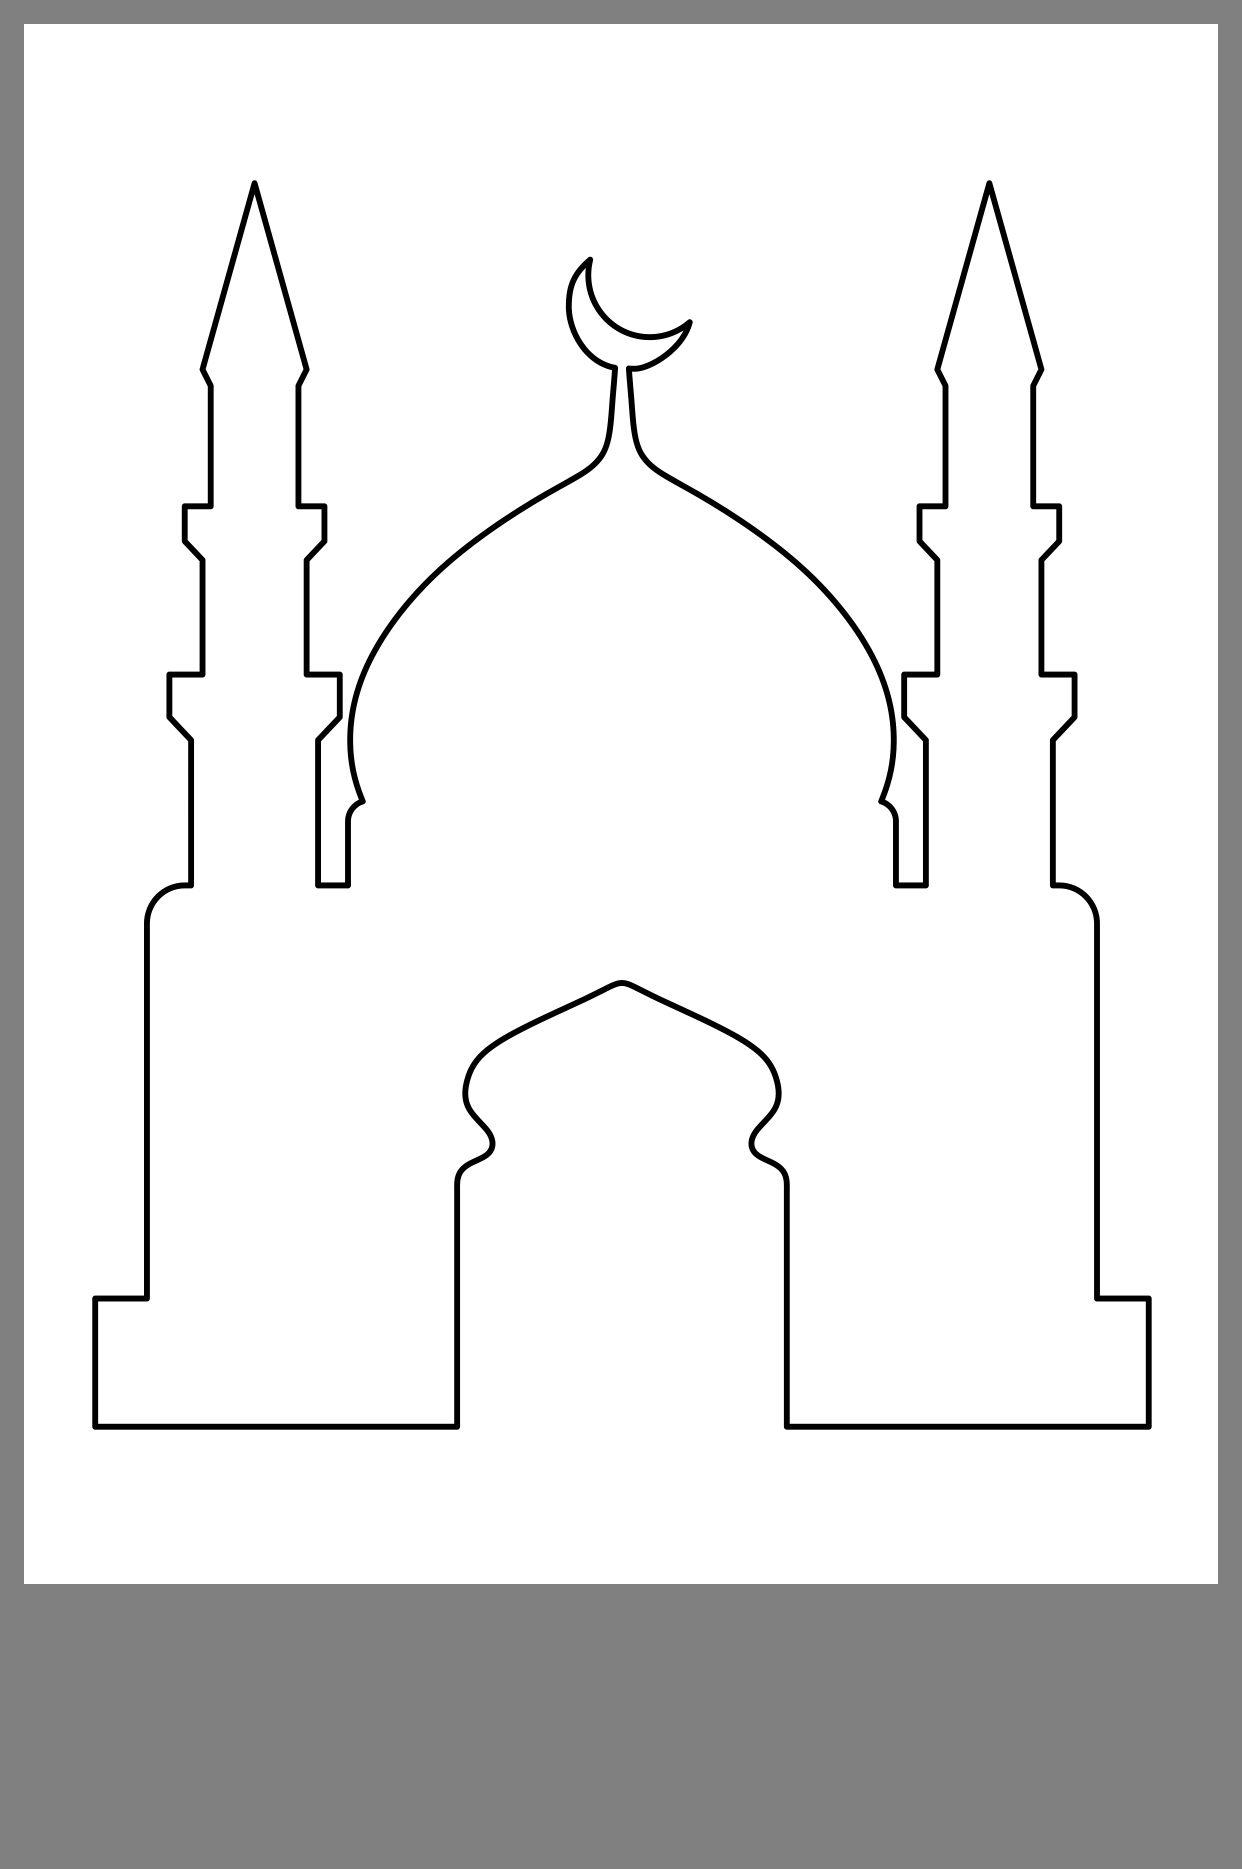 Pin by WAAD on مجسمات Kids and parenting, Ramadan, Pattern